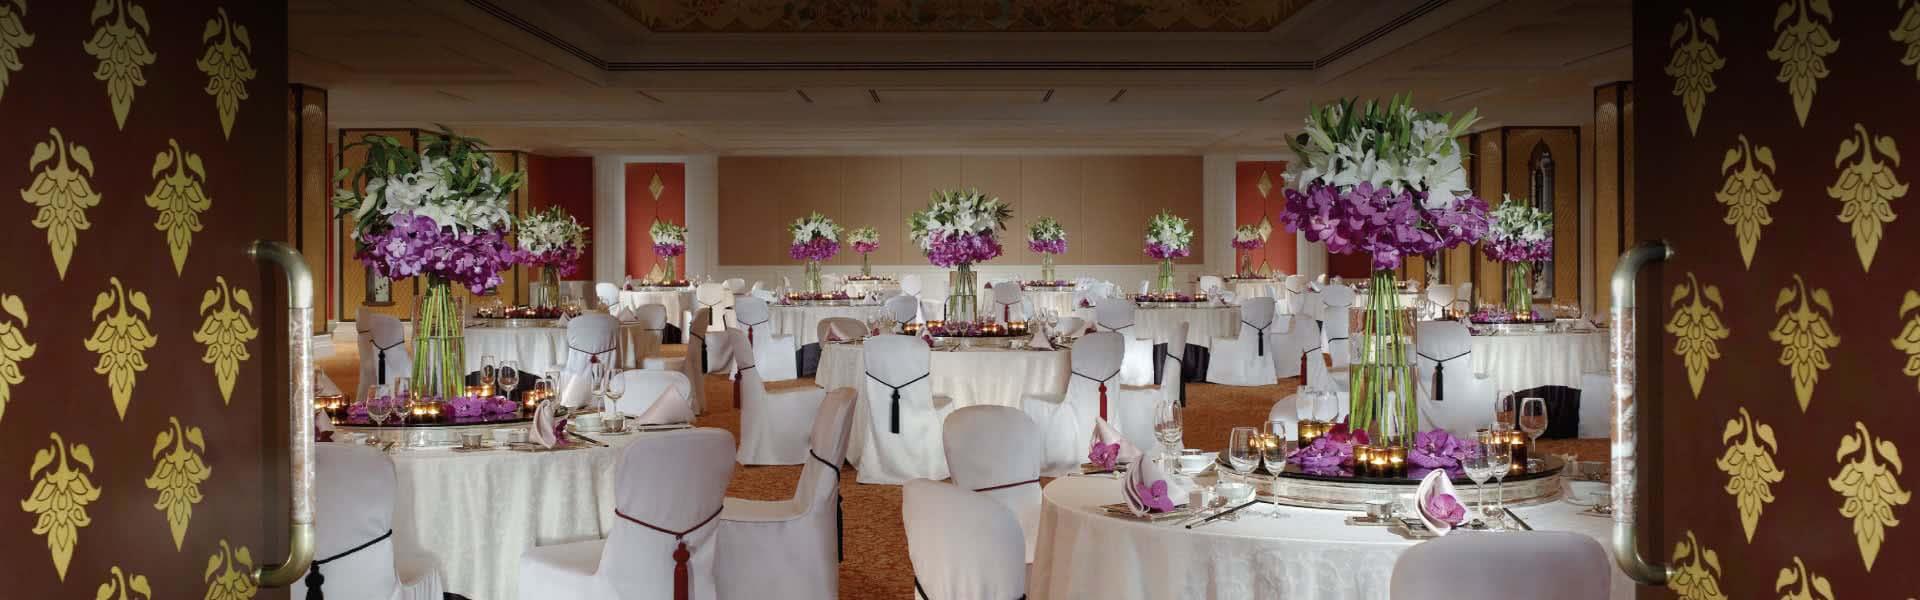 Hotel Foyer Flower Arrangements : Bangkok wedding anantara siam hotel